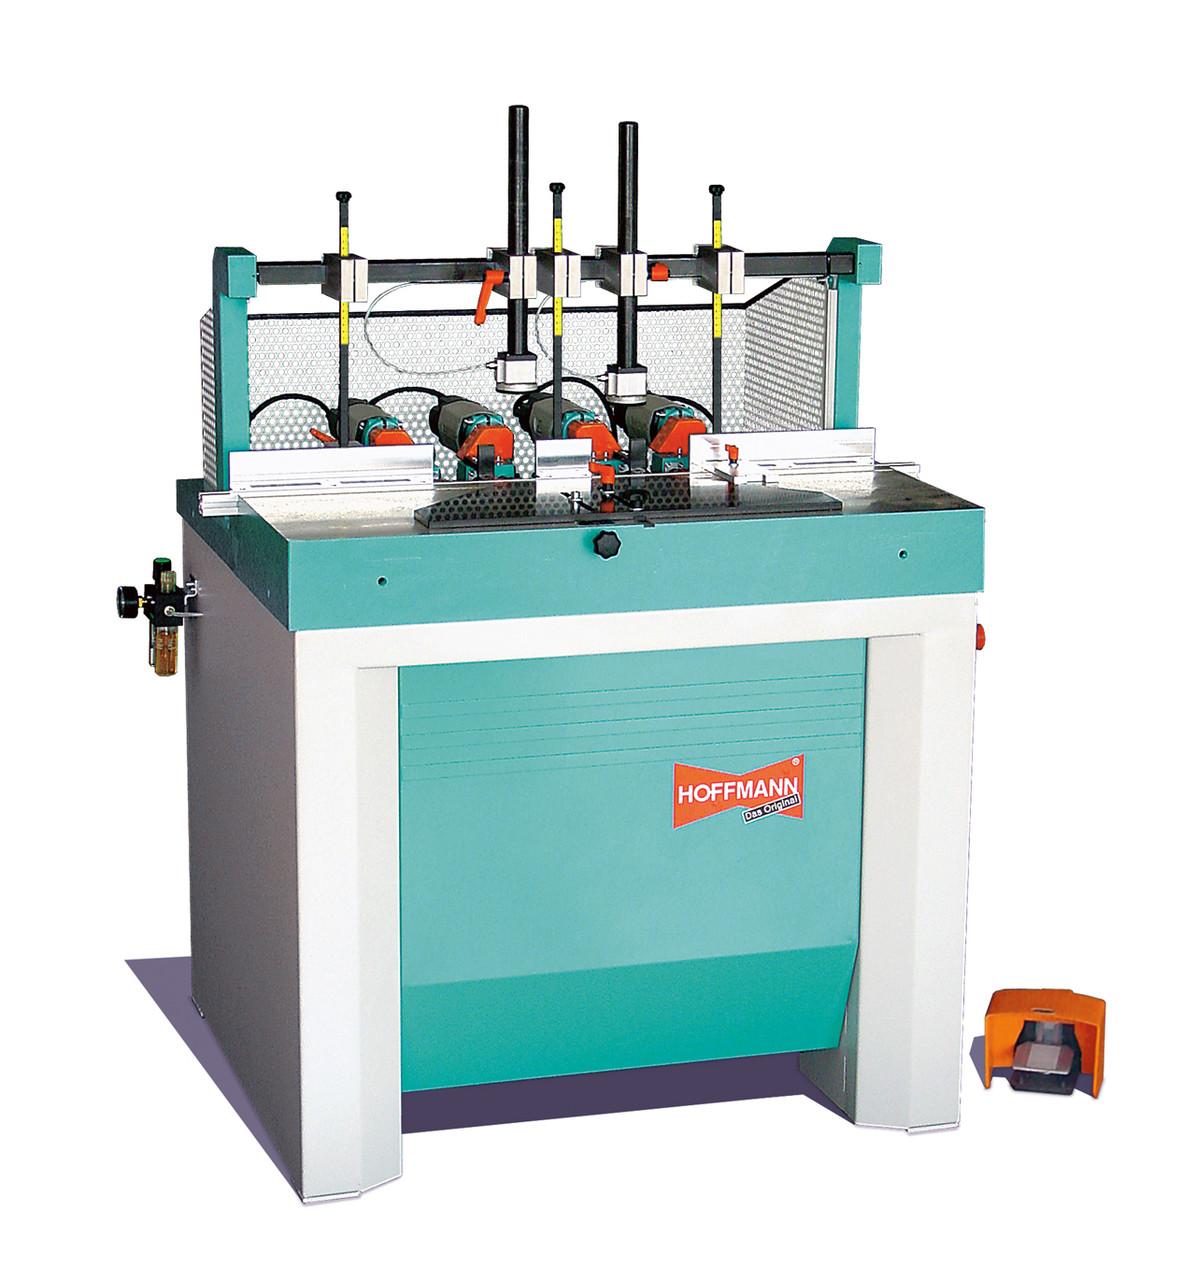 PP2TAB4-Hoffmann-Dovetail-Routing-Machine-W1085000